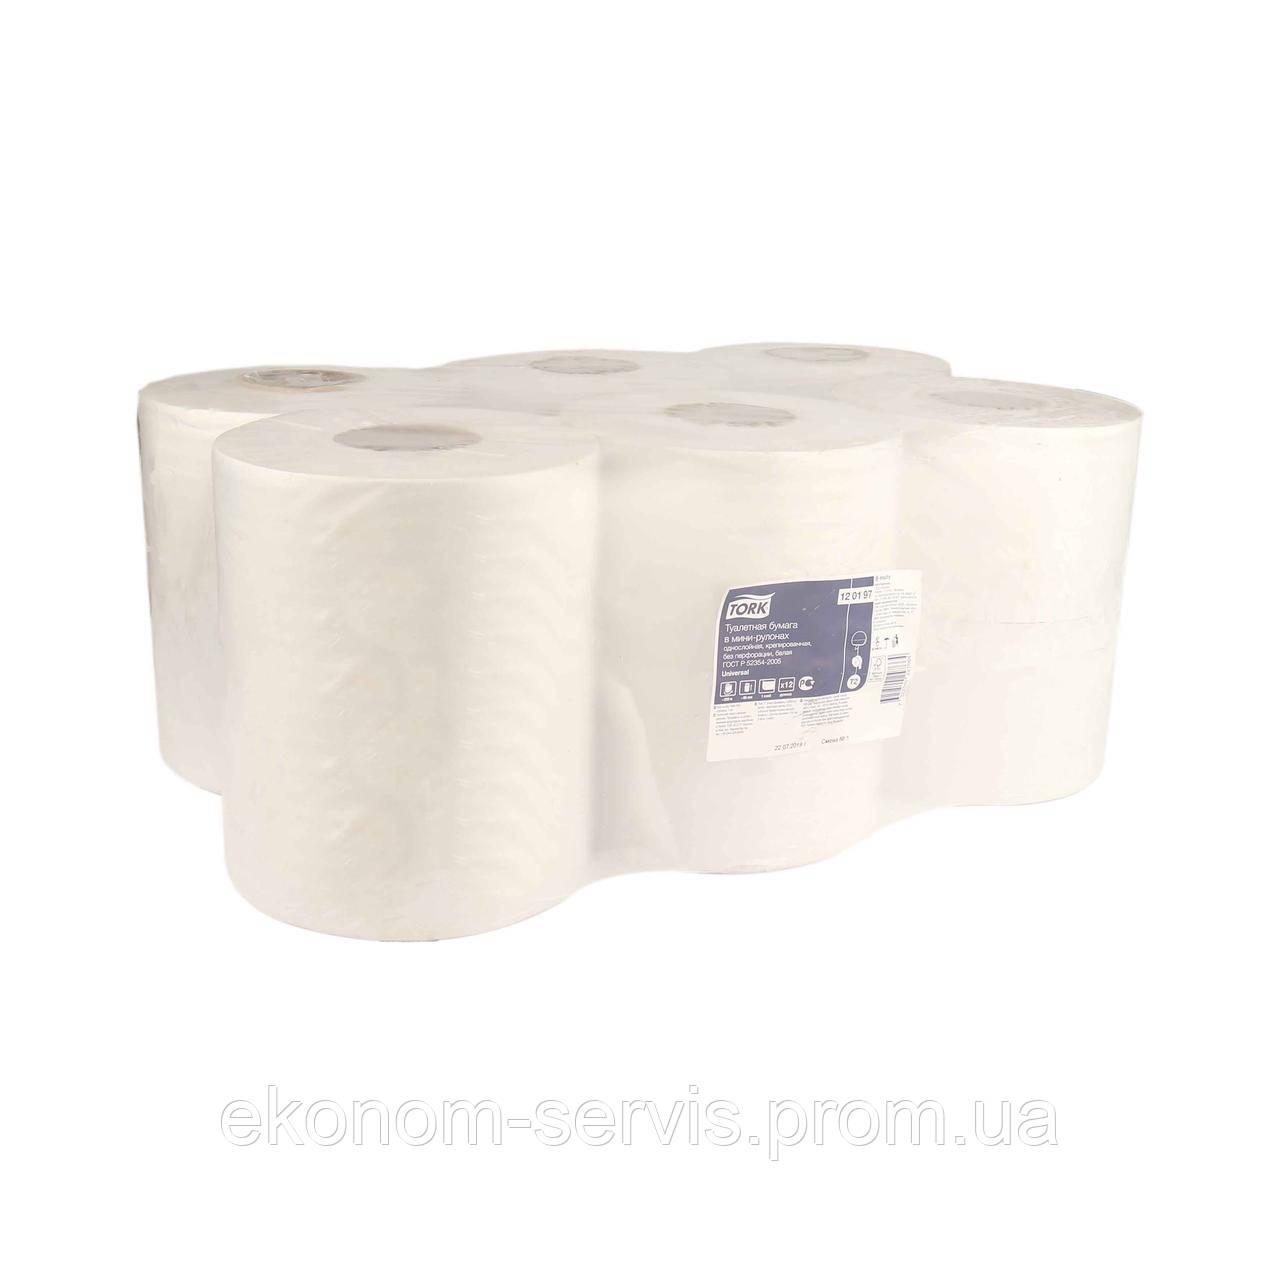 Туалетная бумага Tork Universal в мини рулонах, 1-сл, 10см, 200м, 12шт